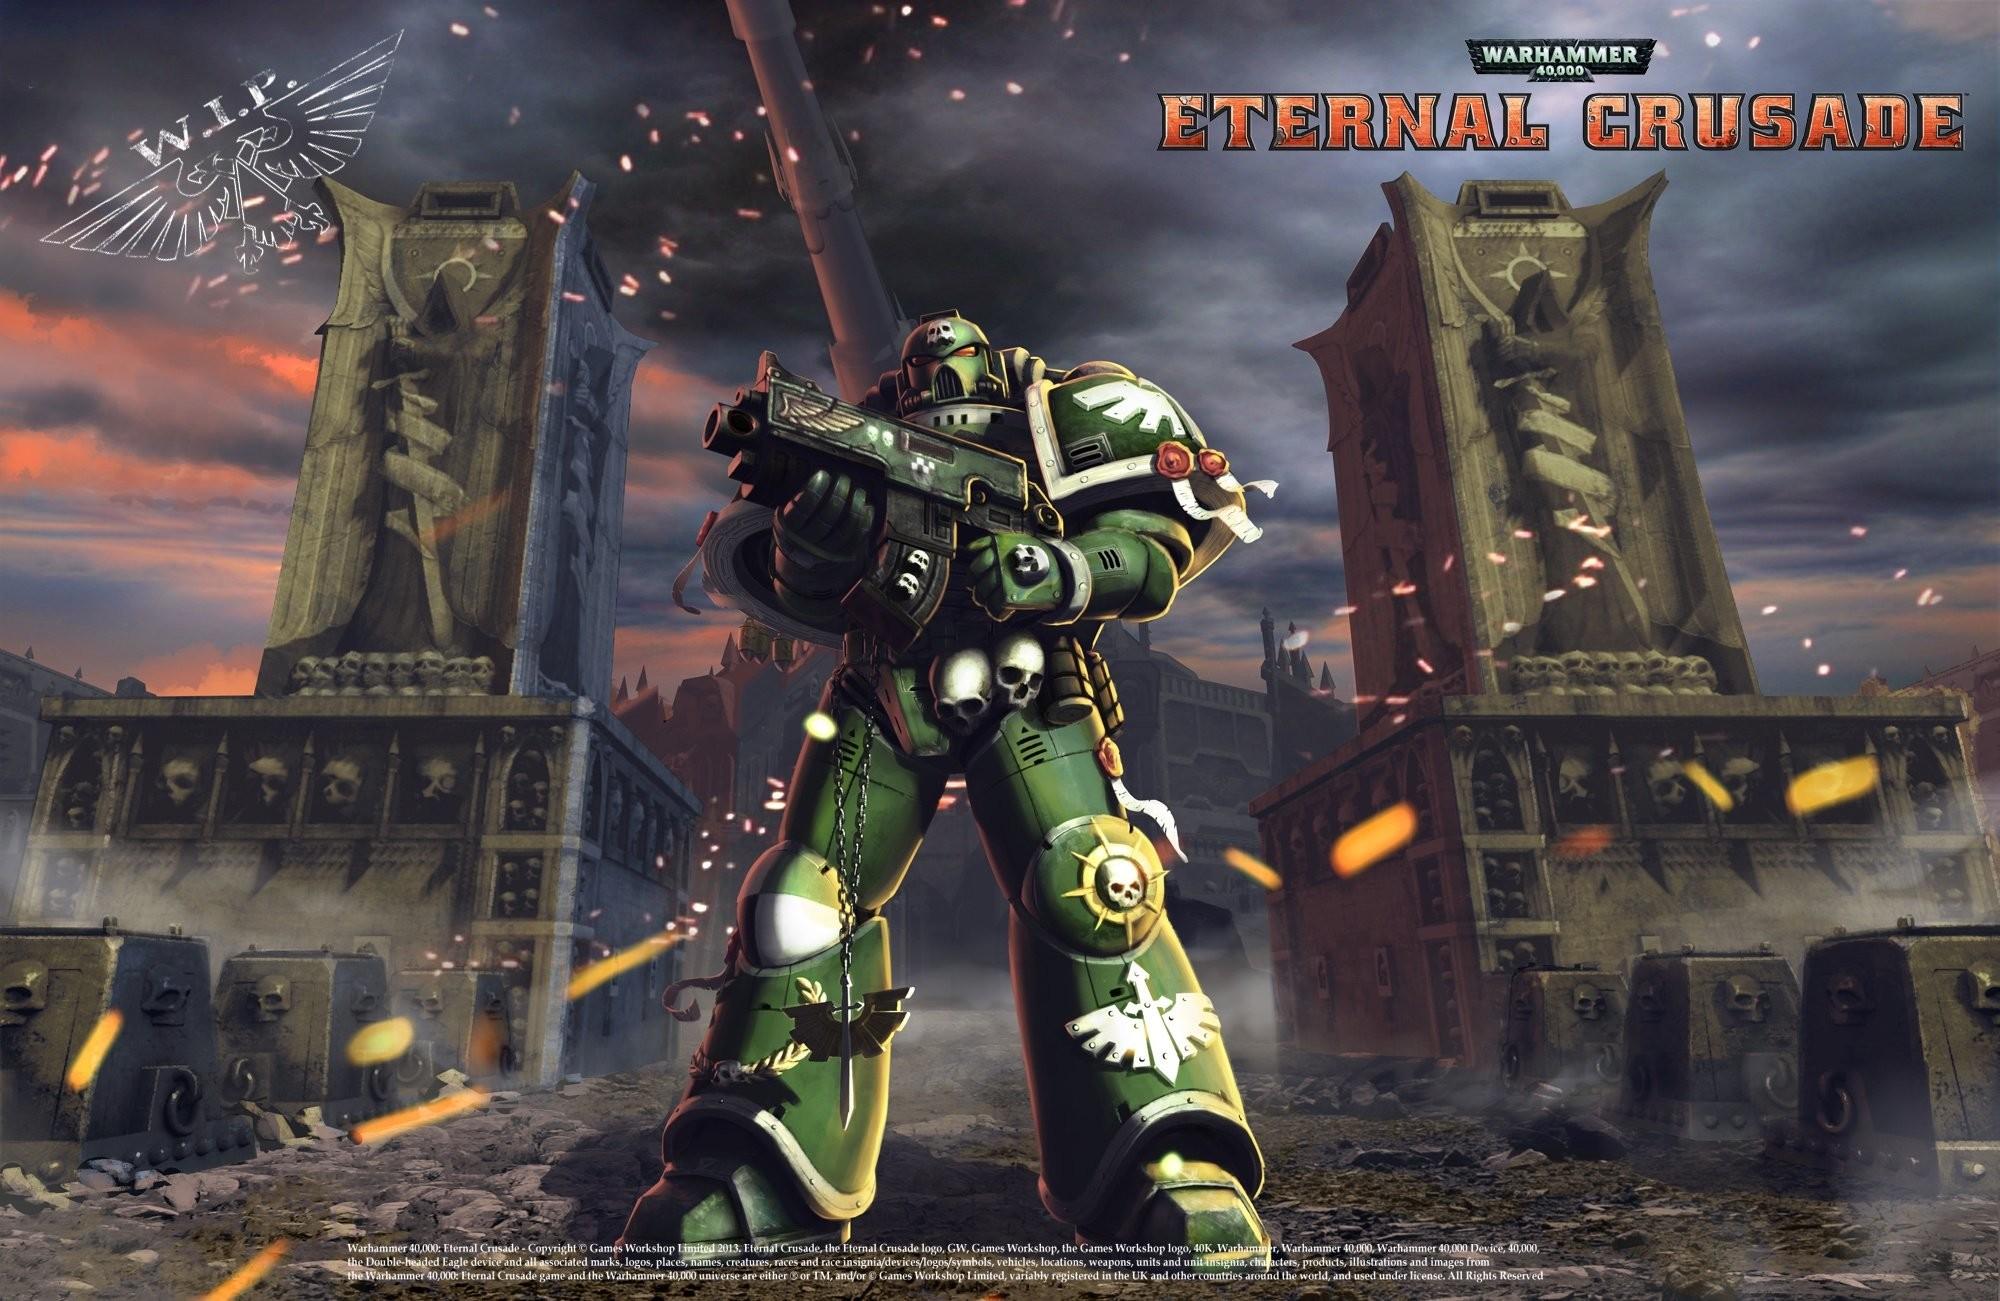 WARHAMMER tactical strategy fantasy sci-fi warrior battle dark 40k poster  wallpaper | | 820195 | WallpaperUP